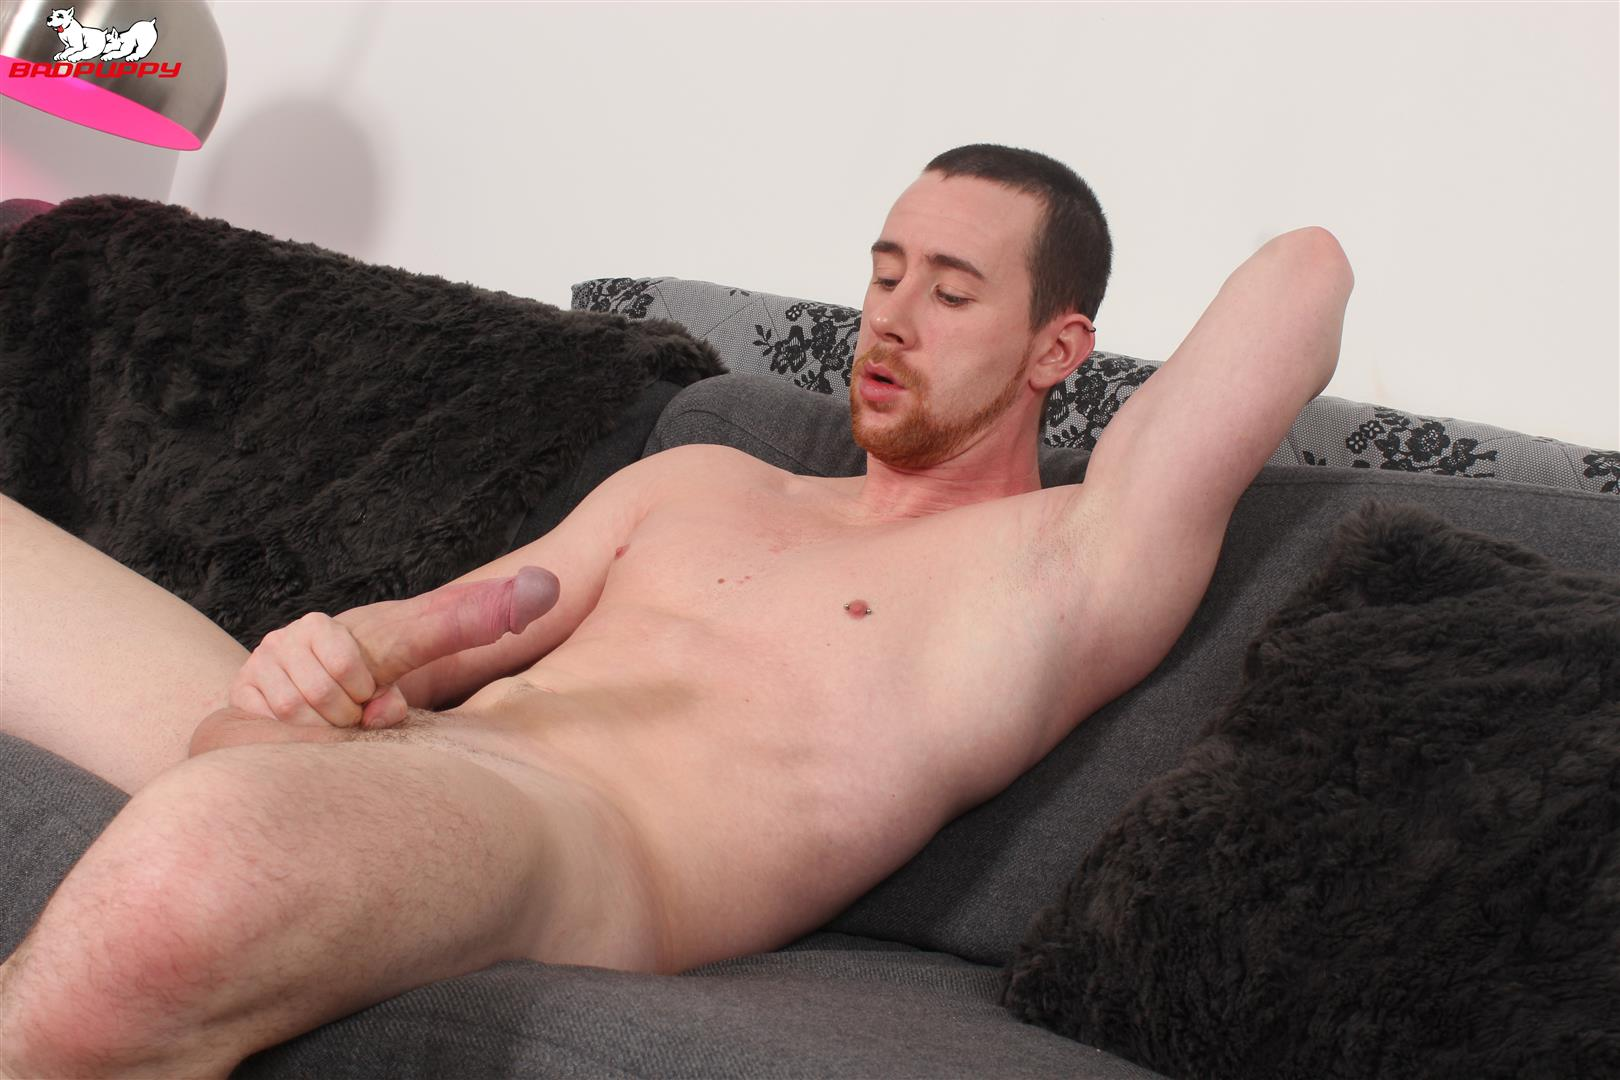 Badpuppy-Anthony-Naylor-Big-Uncut-Cock-Masturbation-14 Sexy British Amateur Plays With His Big Uncut Horse Cock